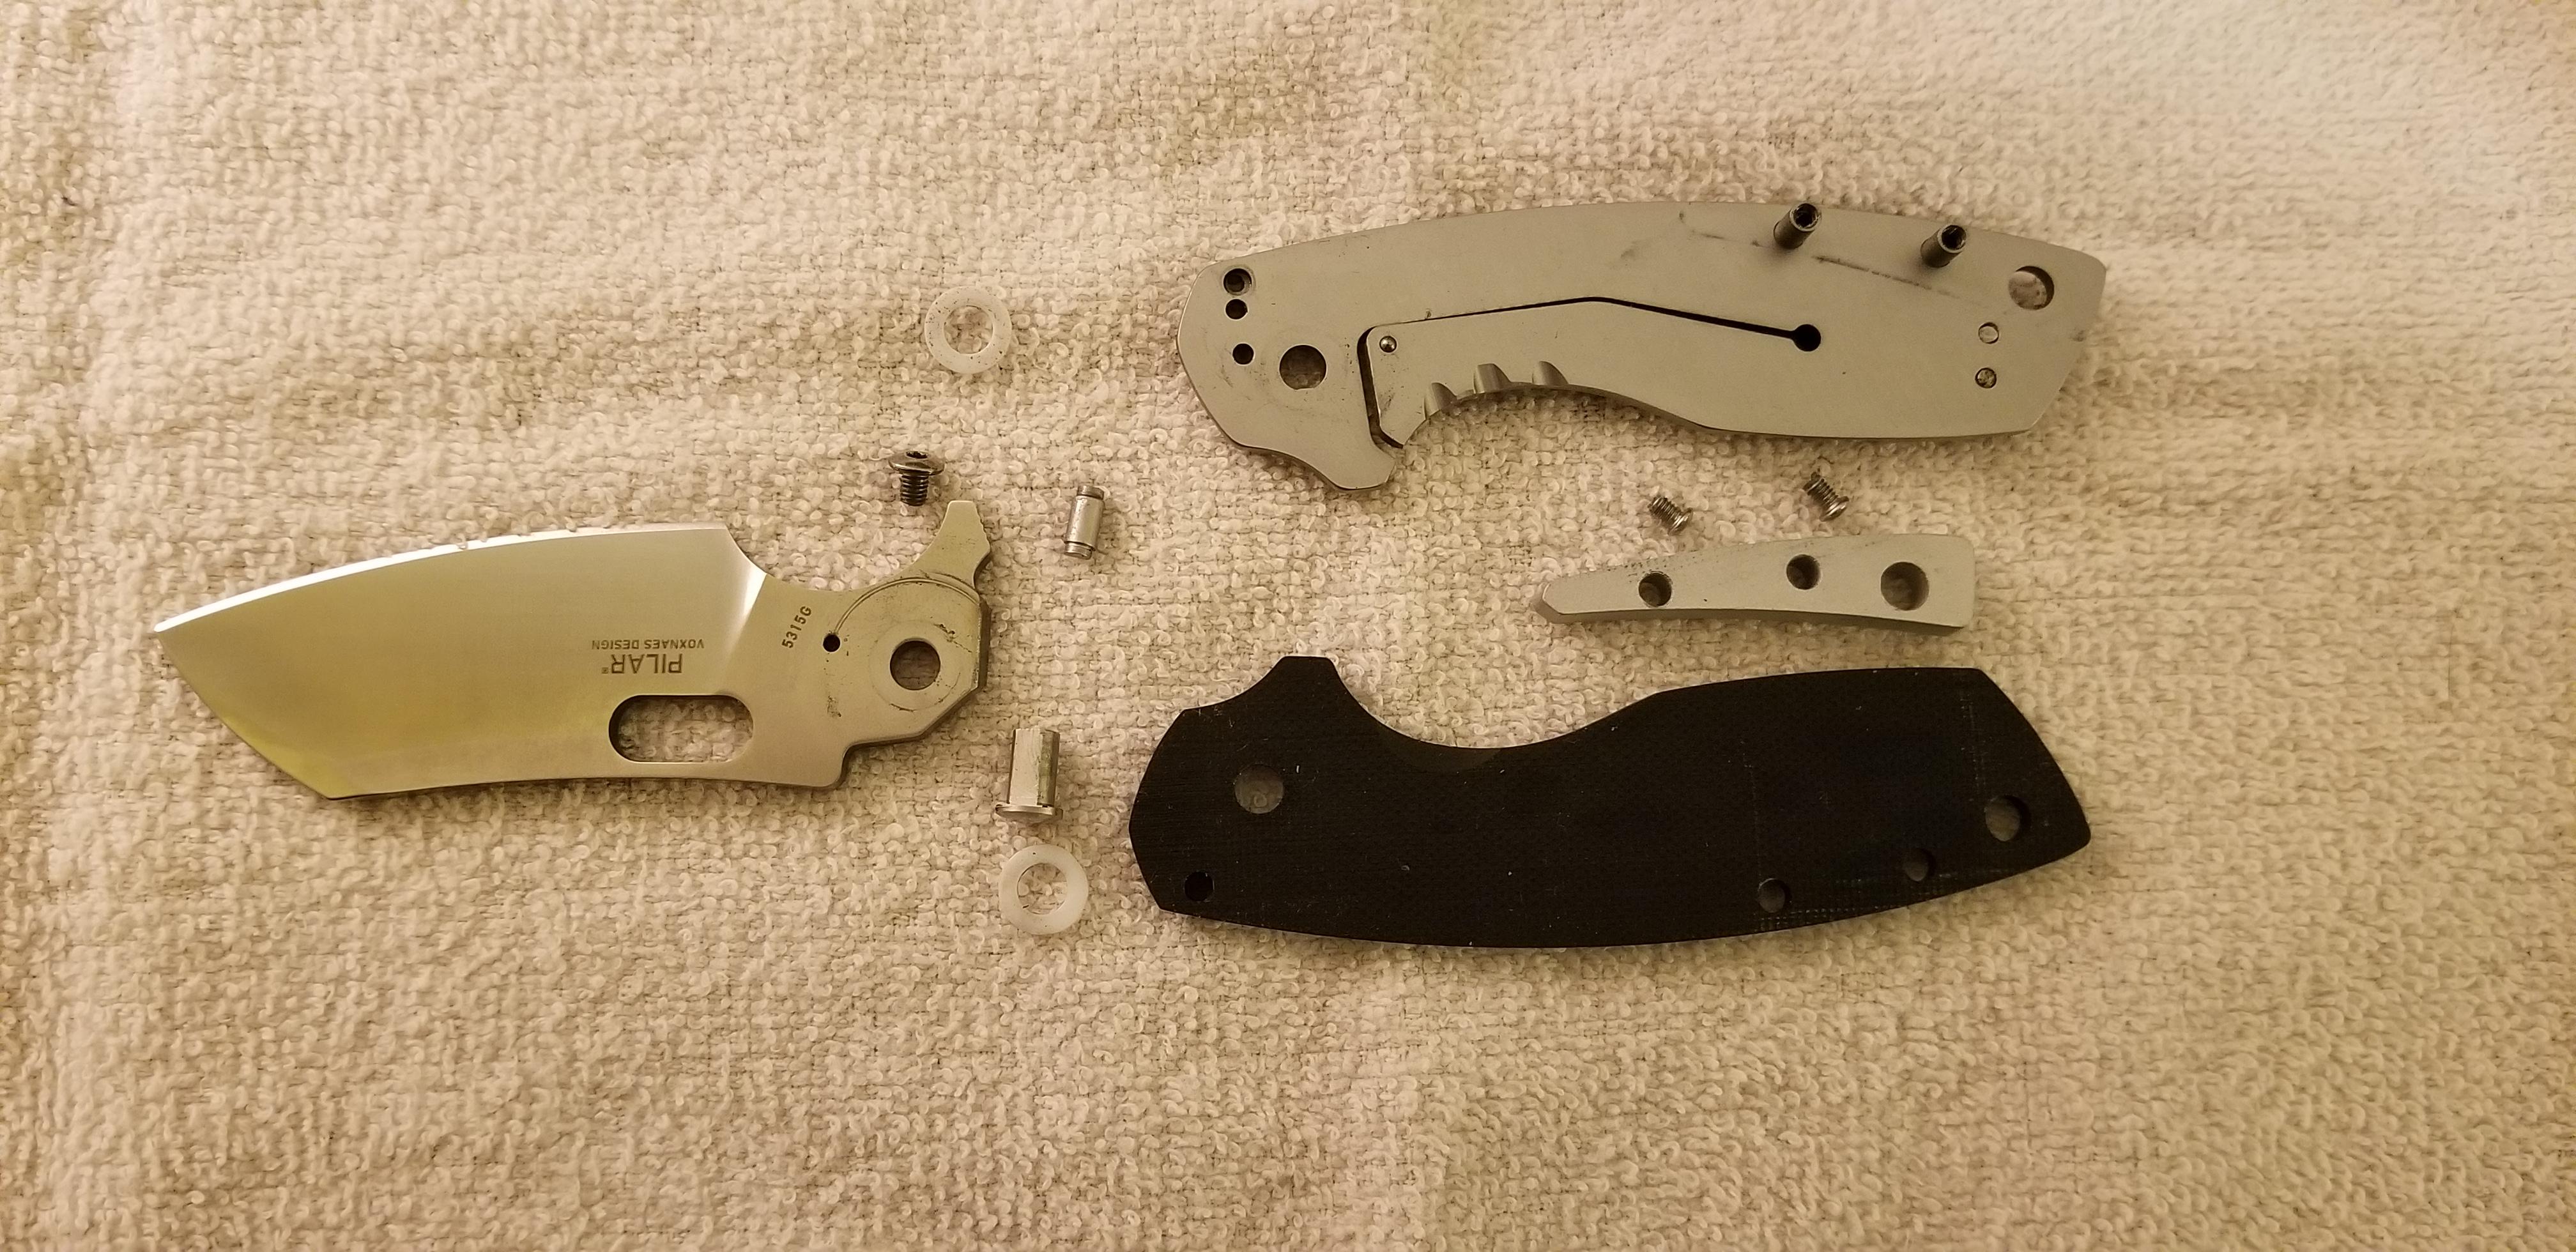 CRKT Pilar Large Review: Top EDC Knife Gets Bigger   GearJunkie